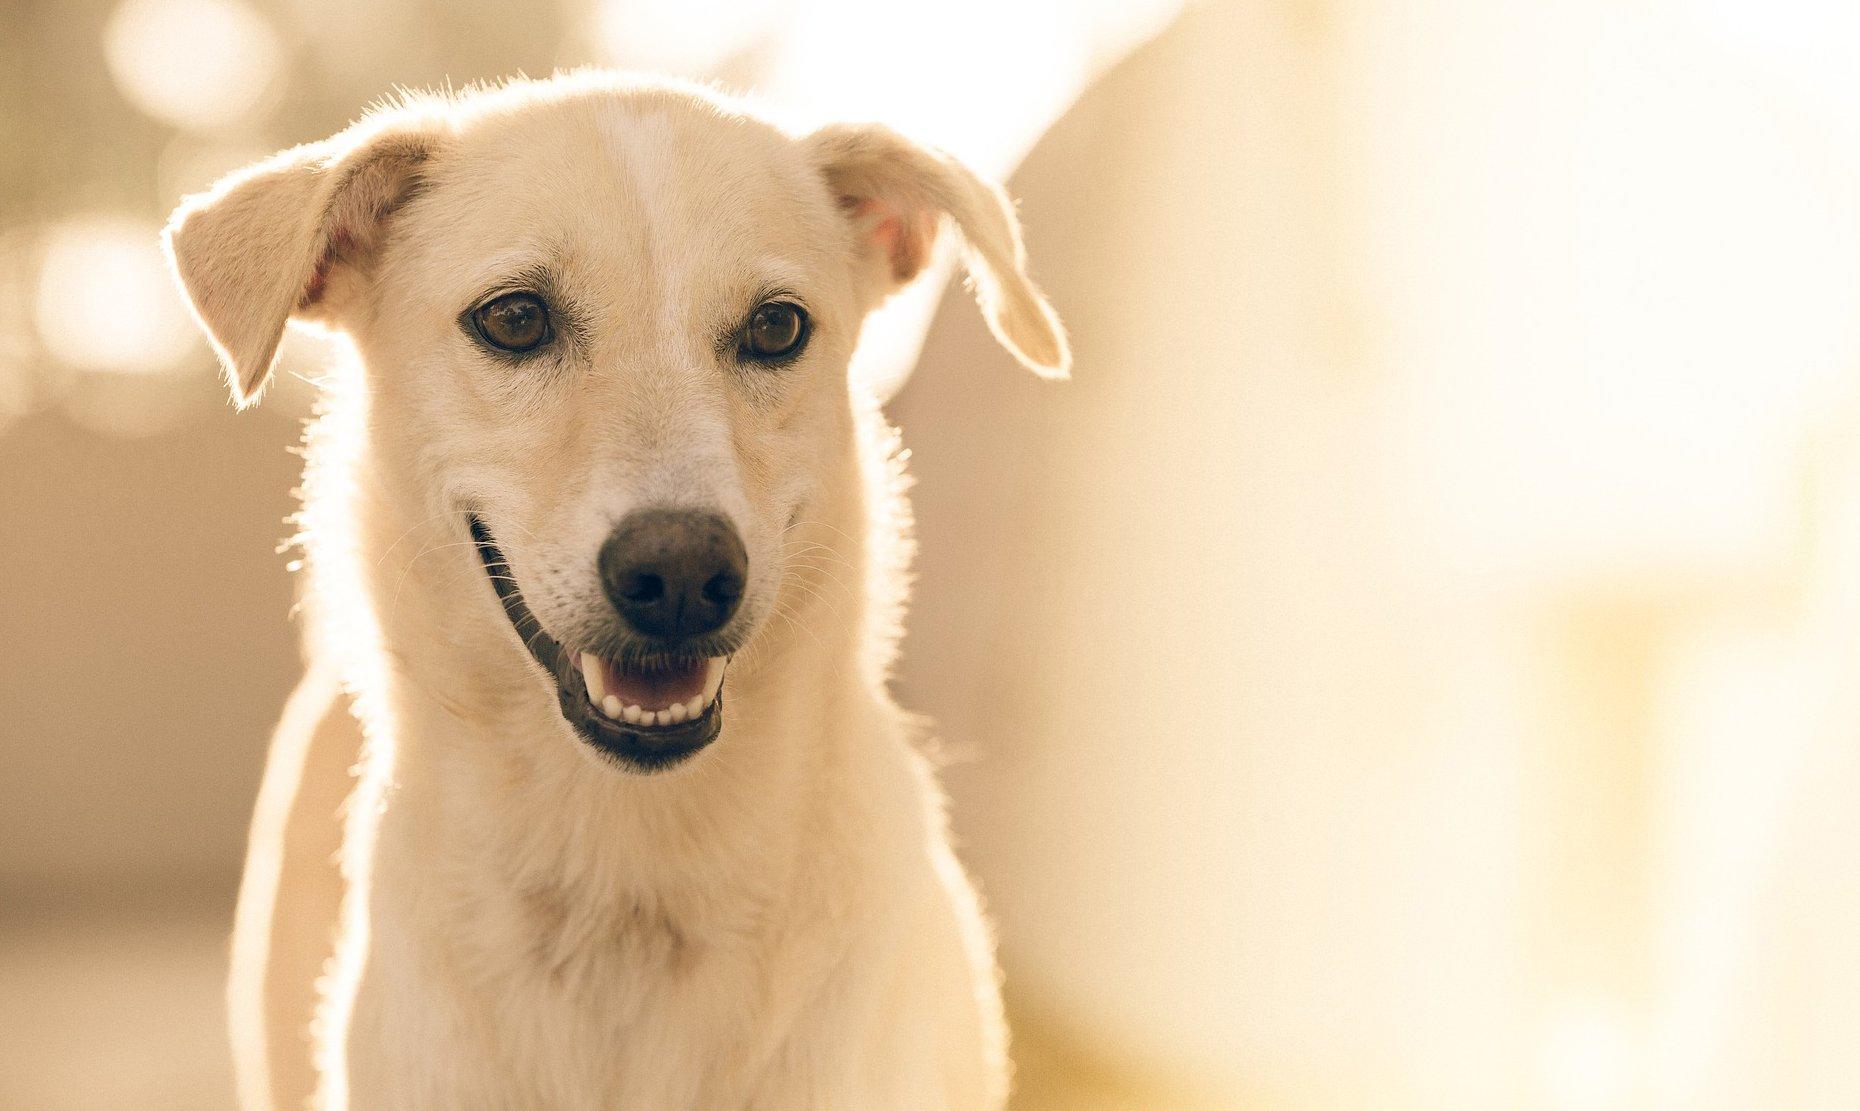 Smiling dog background image | The WellPet Center